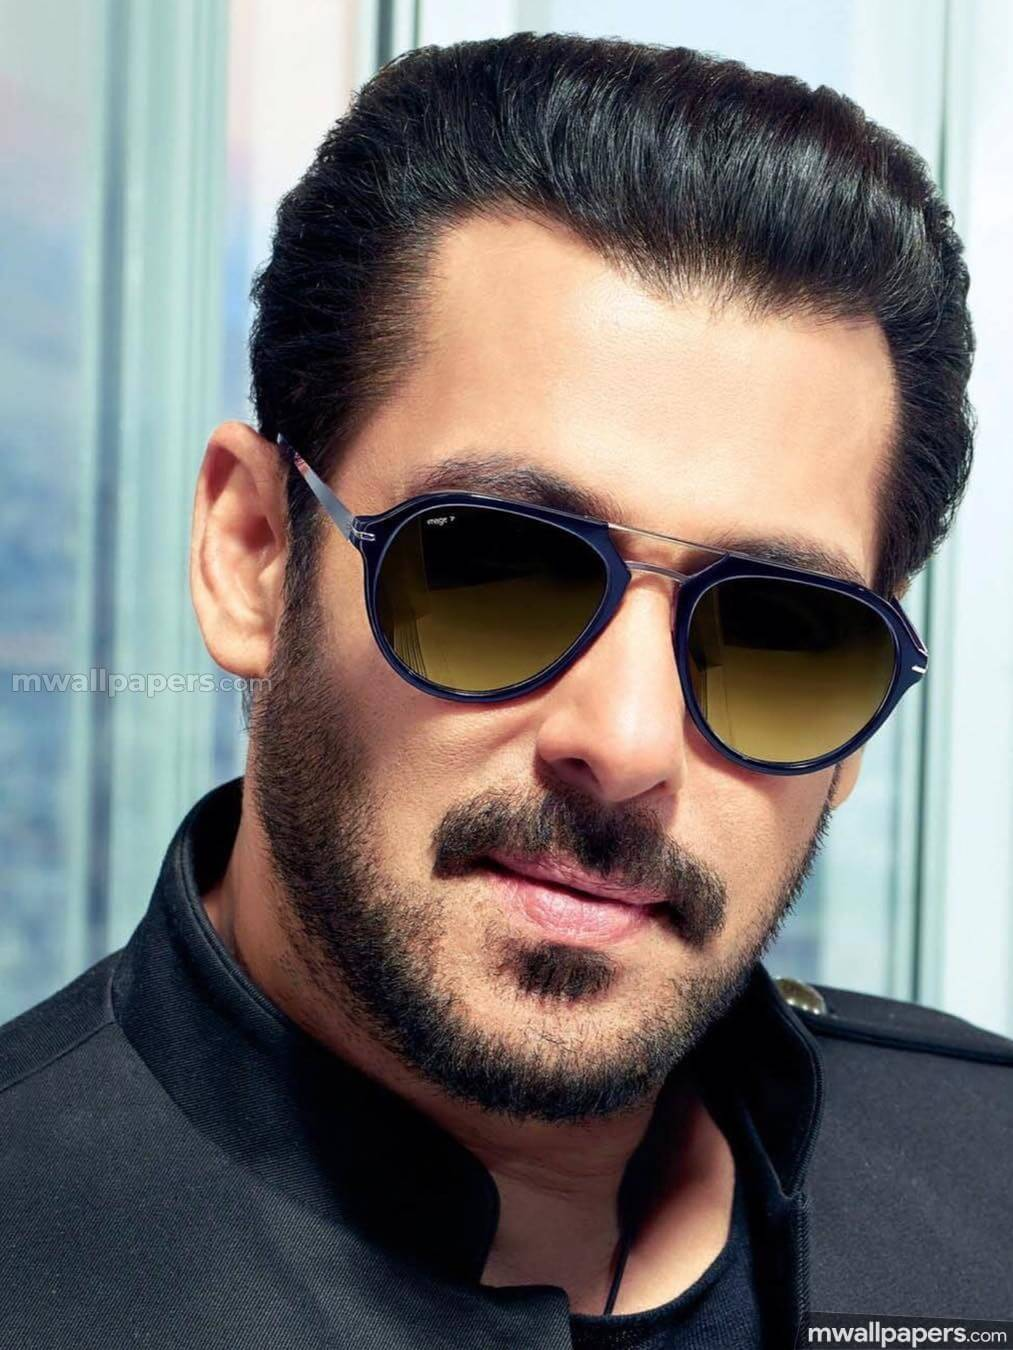 Salman Khan Photo, Age, News, Birthday, Height, Sister, Biography, Girlfriend, Awards, Address, Song, Video, Net Worth, Education, Twitter, Instagram, Facebook, Wiki, Imdb, Website, Youtube (26)